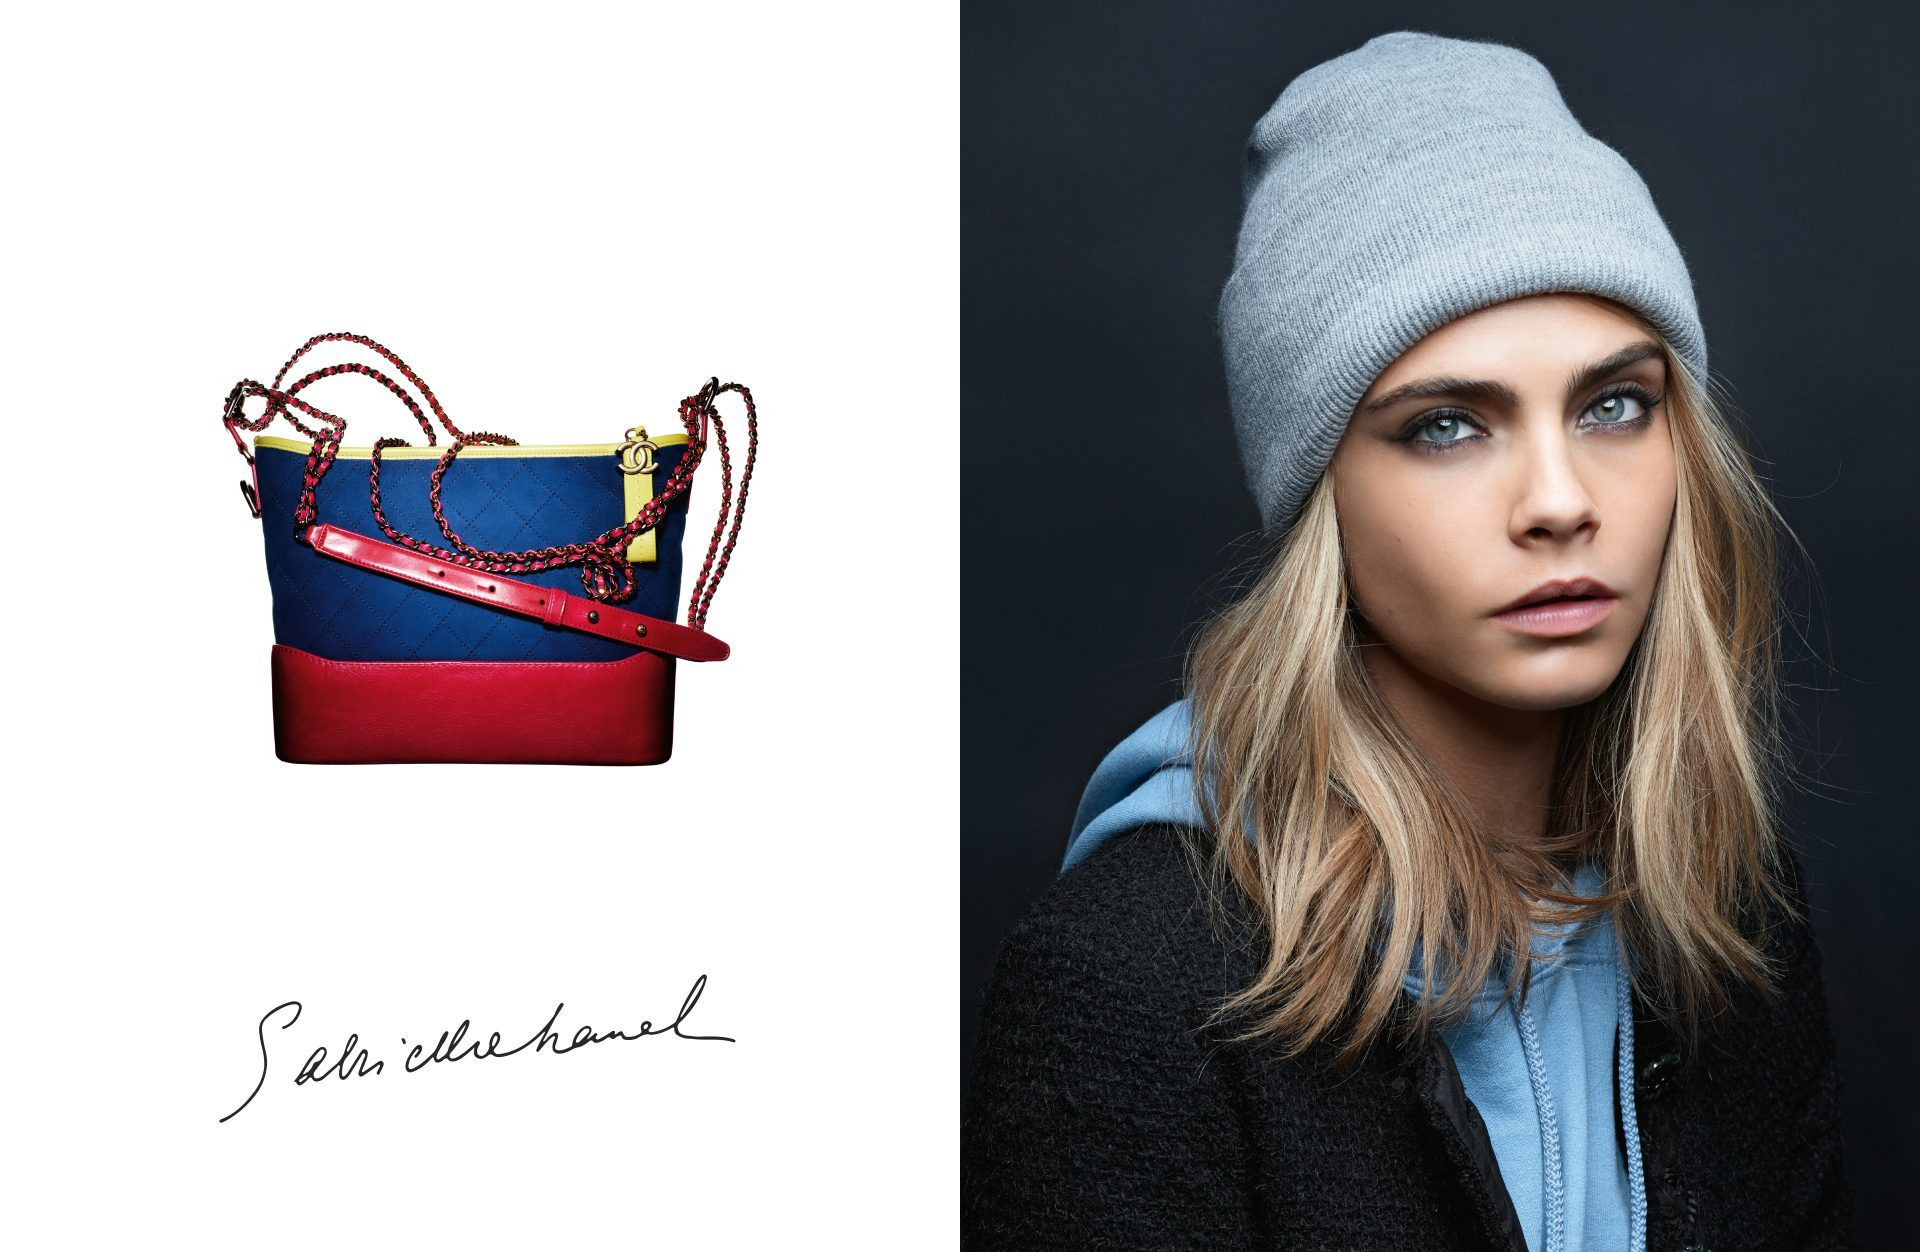 chanel-gabrielle-handbag-cara-delevigne-spring-2017-ad-campaign-the-impression-02